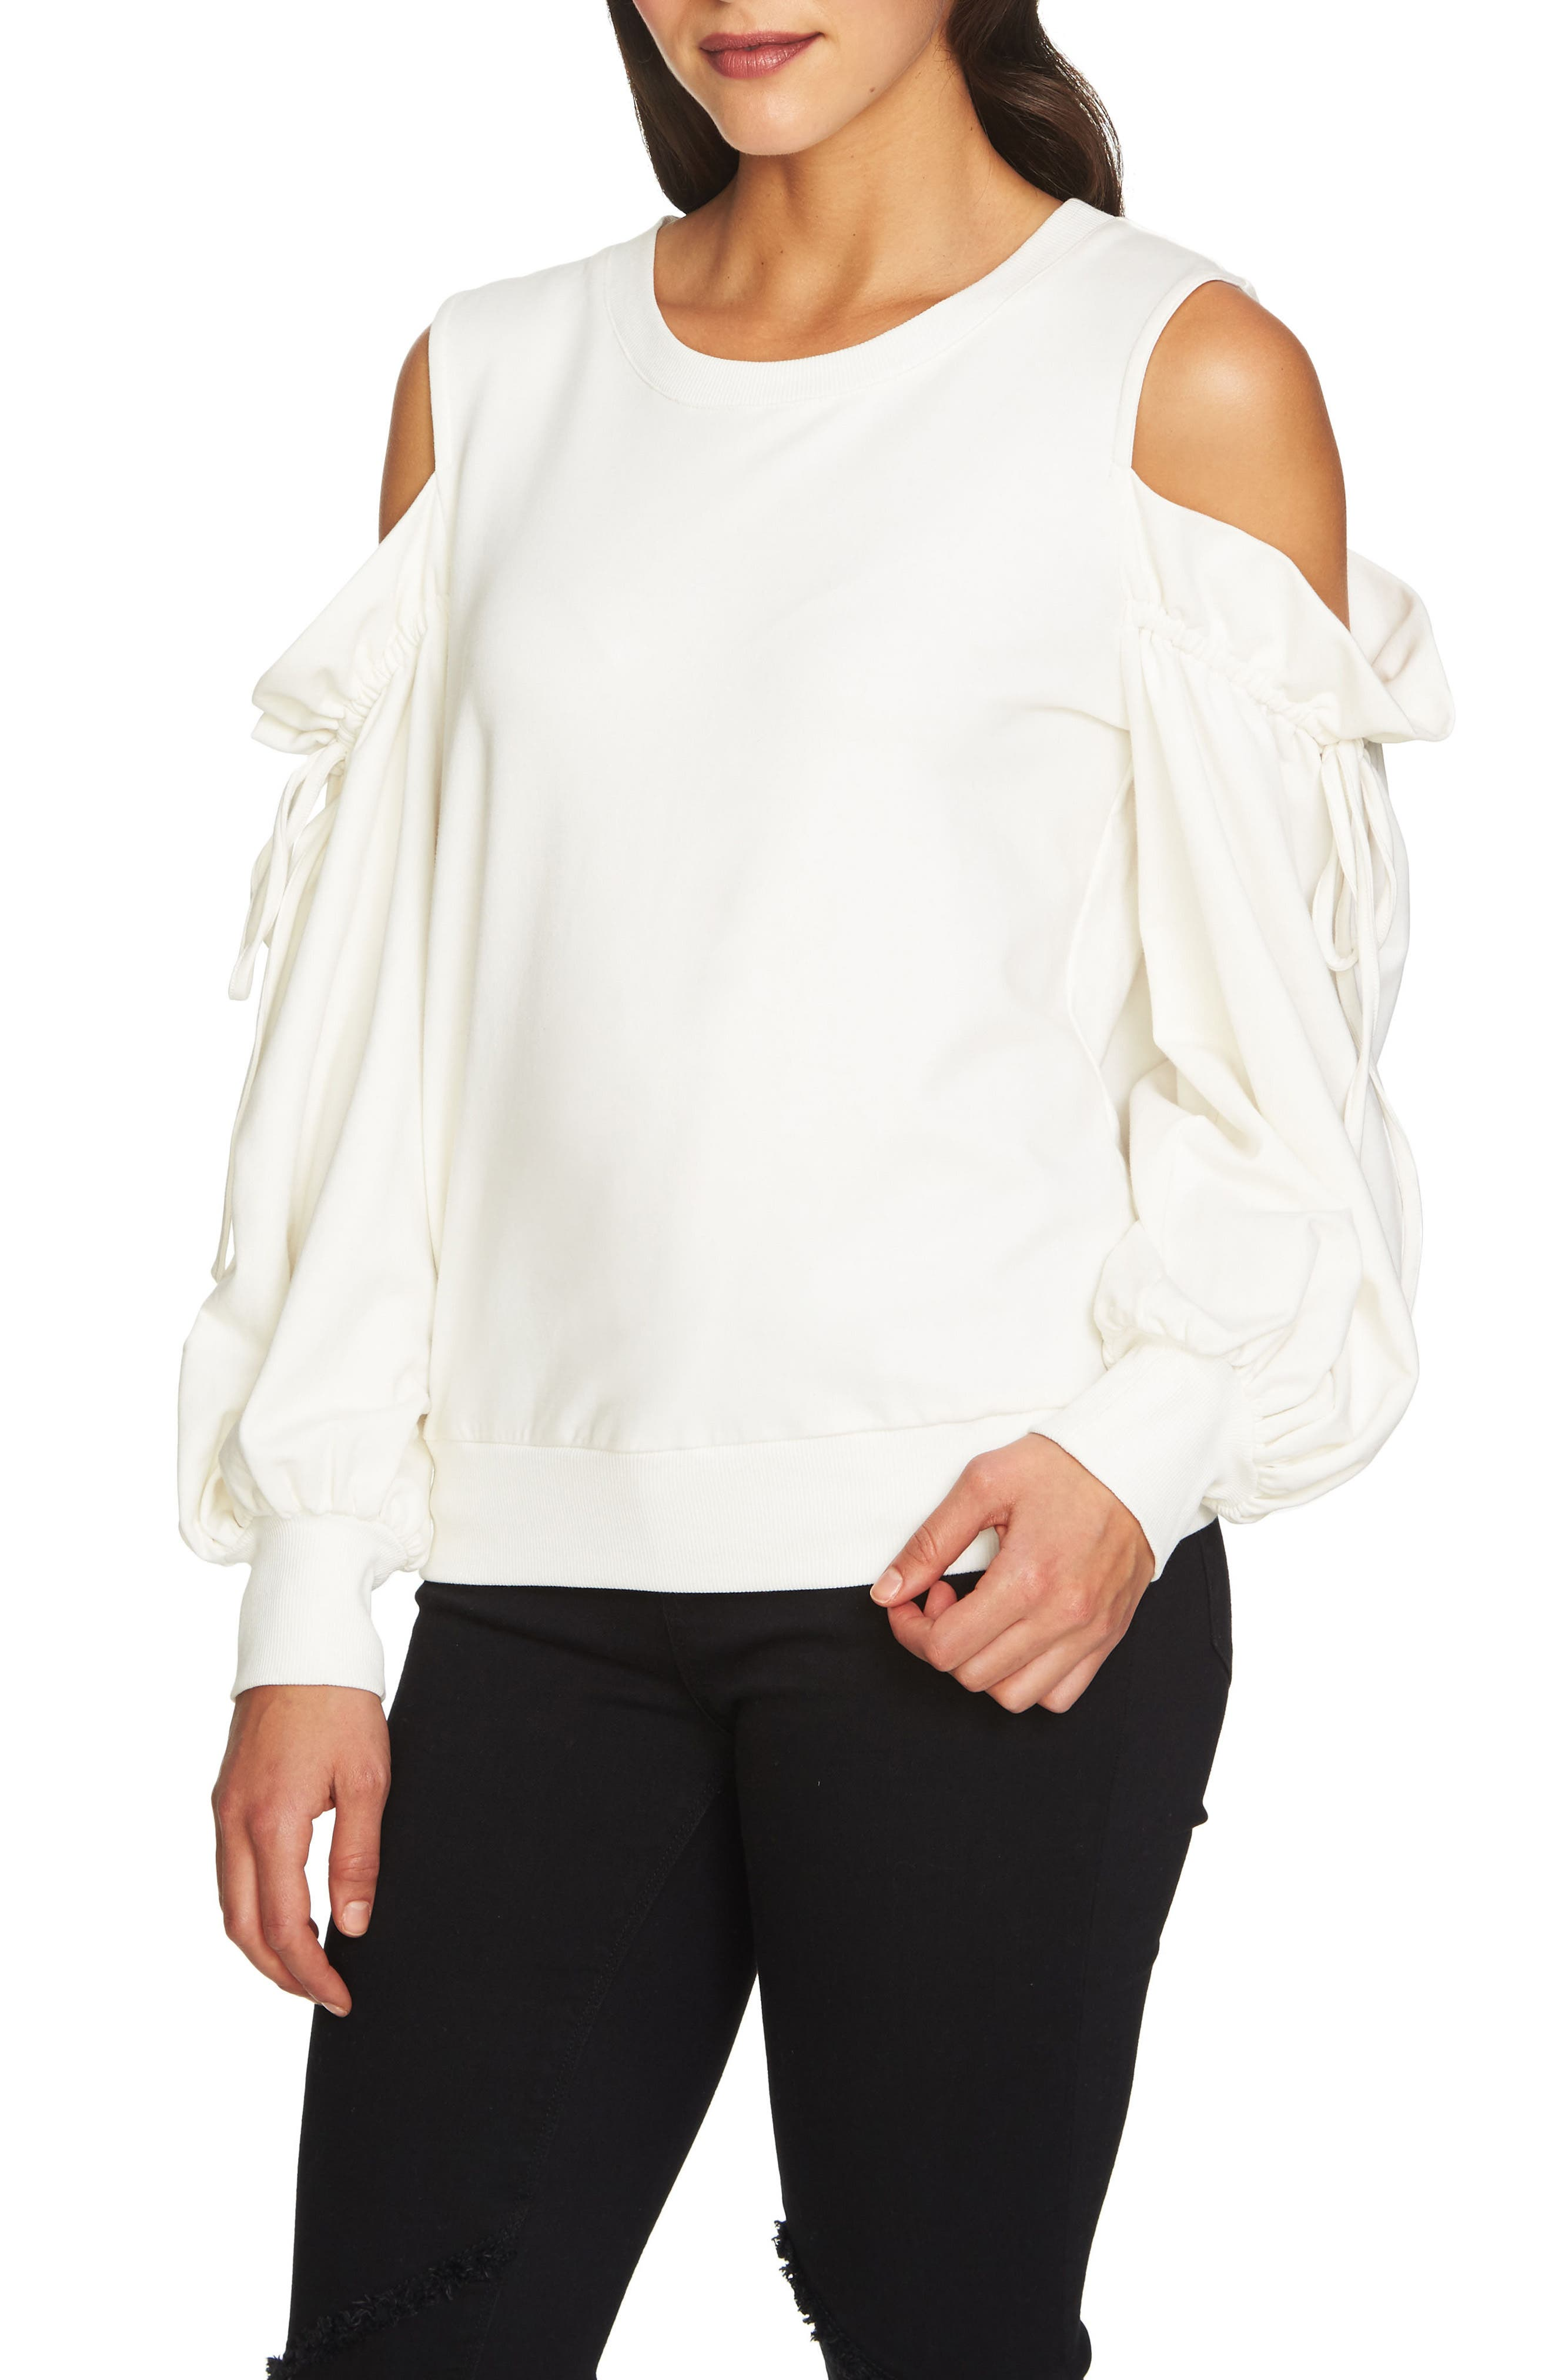 Alternate Image 1 Selected - 1.STATE Cold Shoulder Blouson Sweater